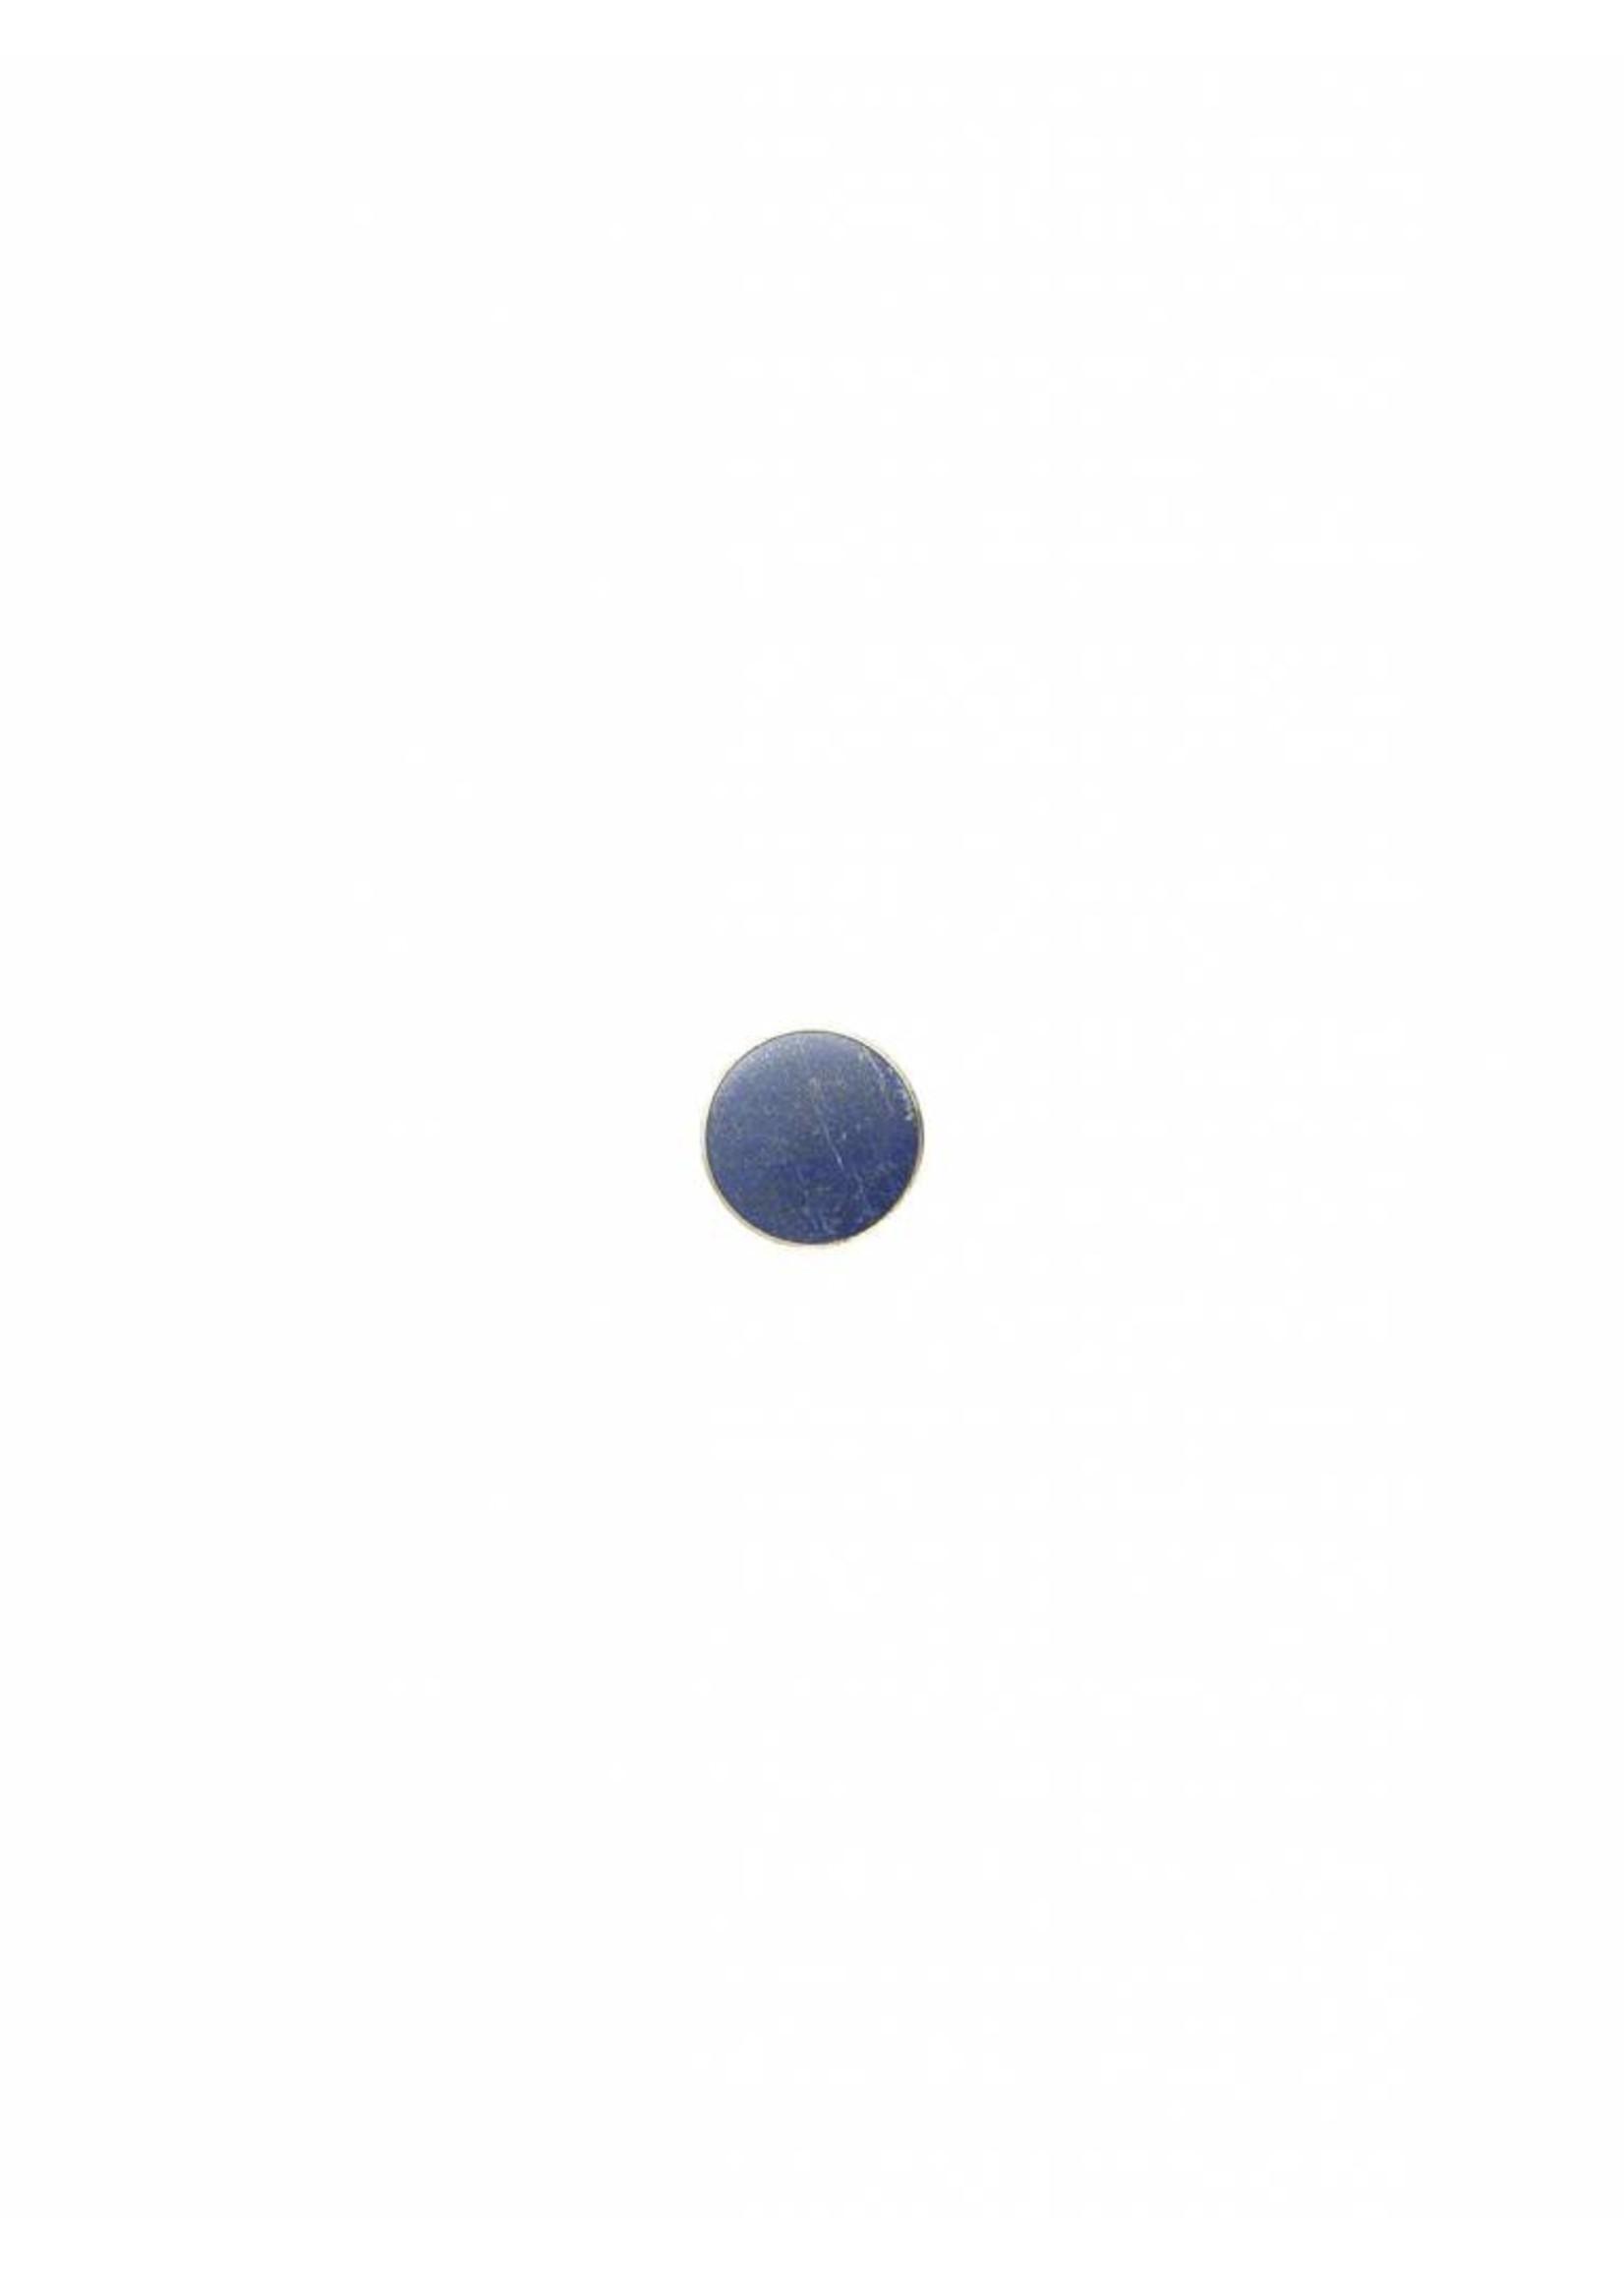 ferm LIVING Ferm Living Hook - Stone - Large - Blue Lapis Lazuli